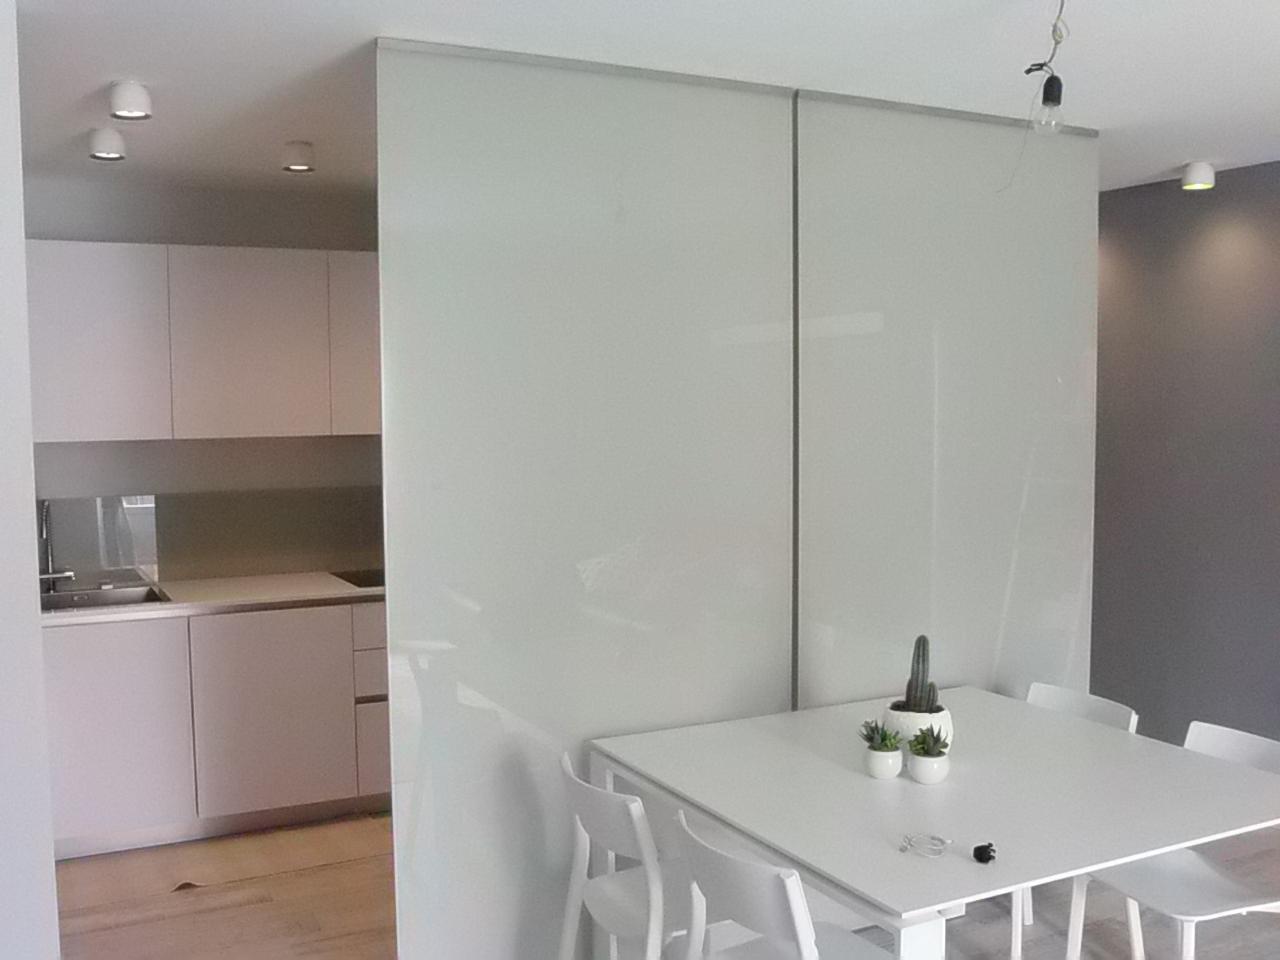 Pareti Divisorie In Vetro Colorato parete divisoria verniciata | pareti divisorie in vetro